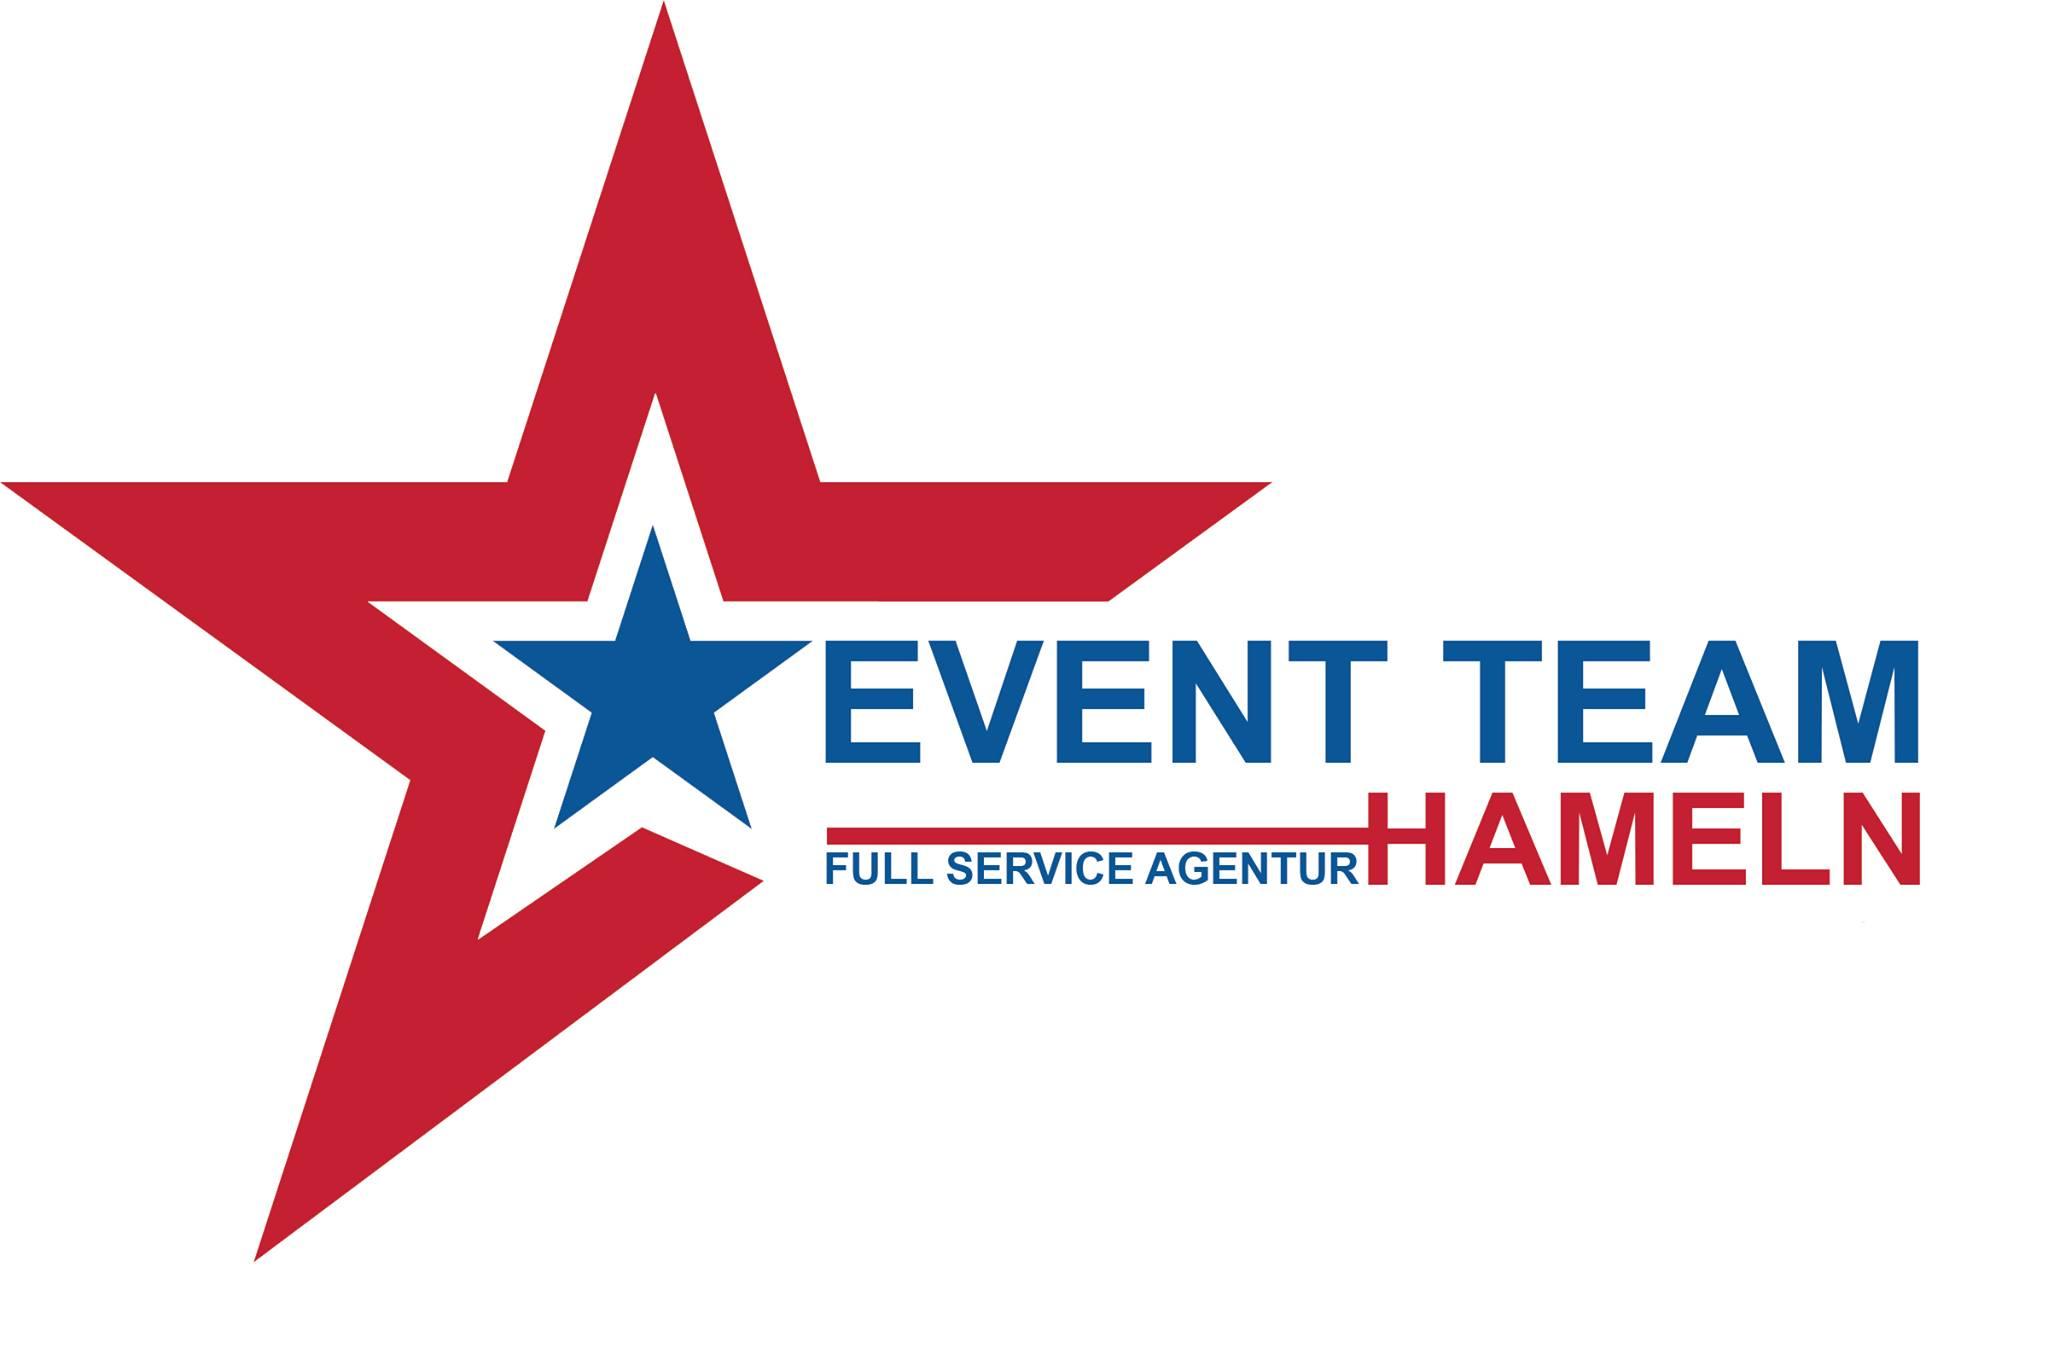 Event Team Hameln